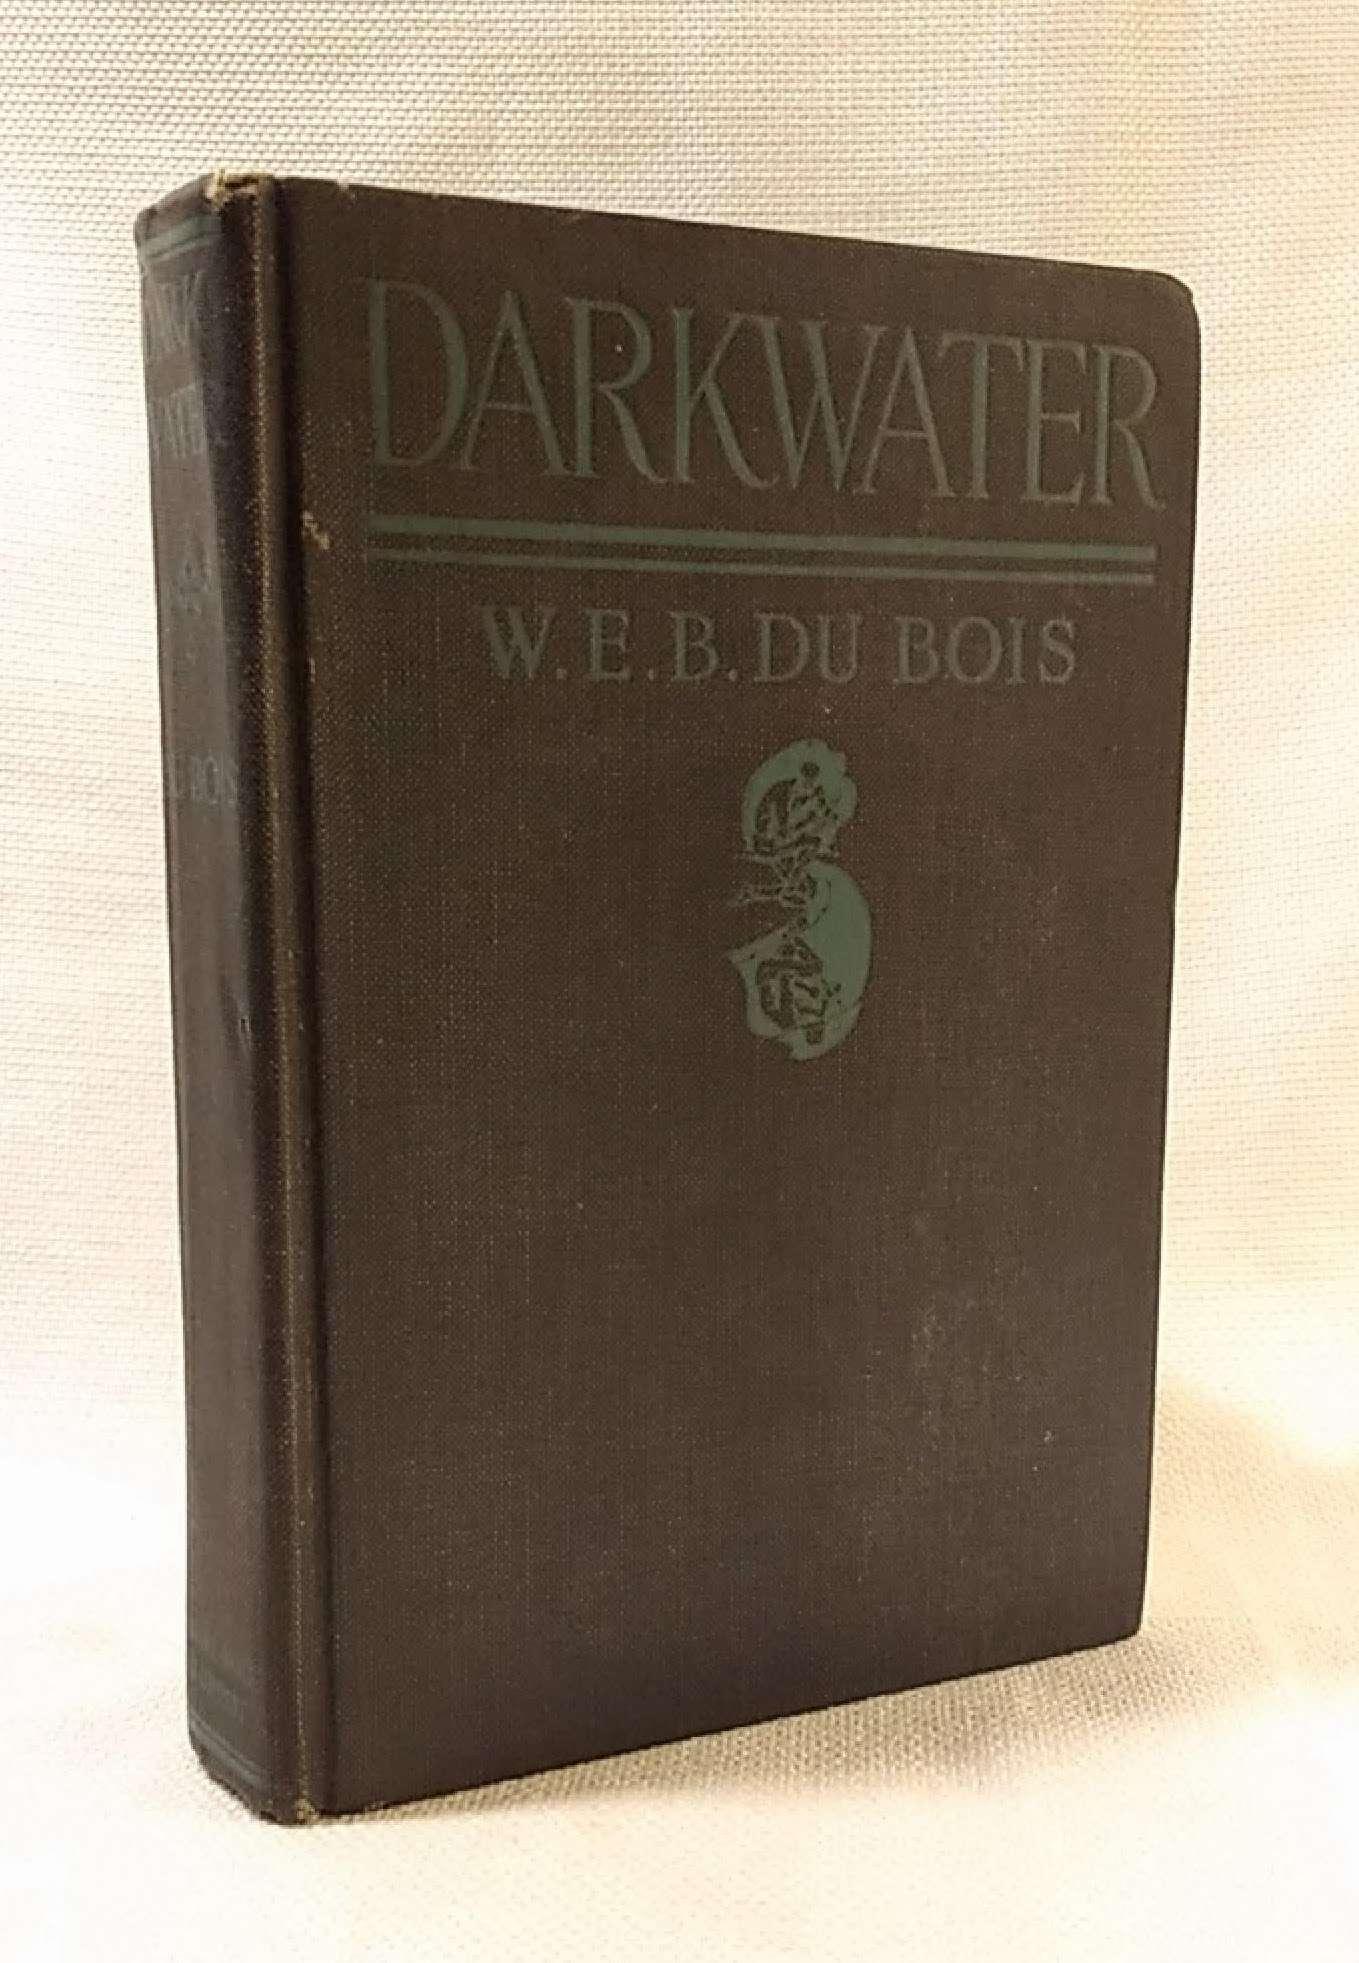 Darkwater (First Edition), Du Bois, W.E.B.